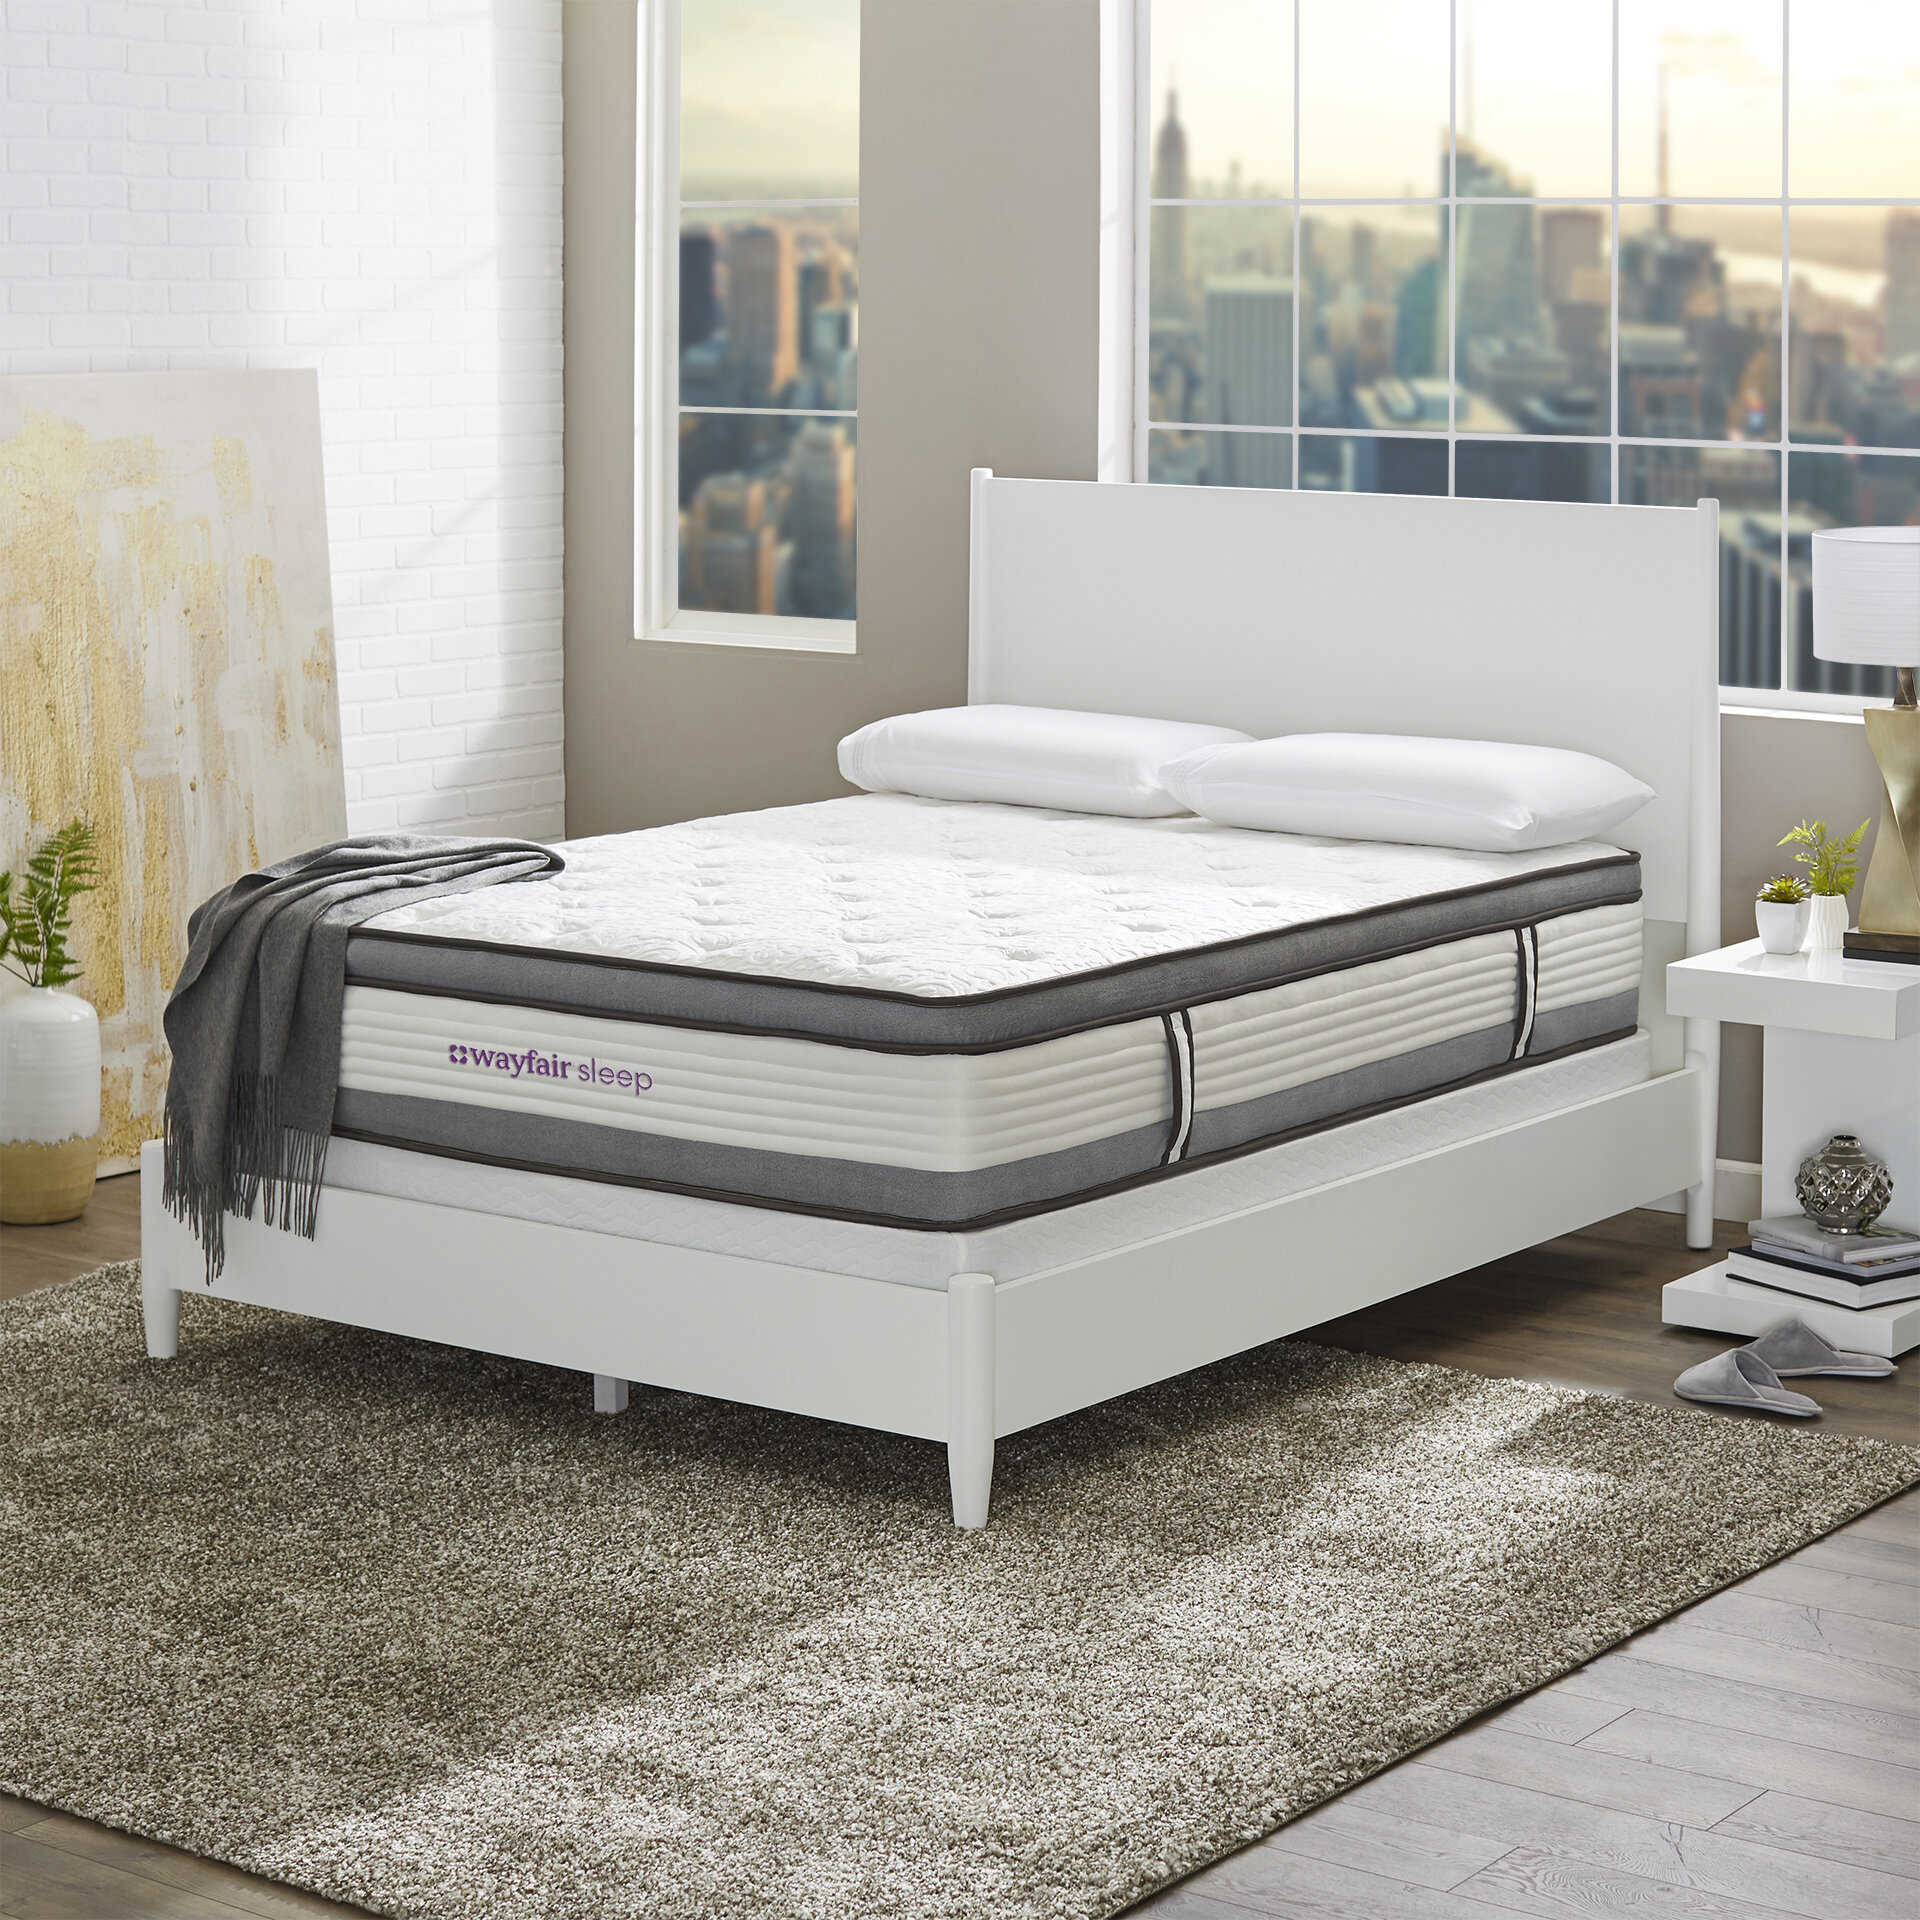 Wayfair Sleep 12 Medium Hybrid Mattress Reviews